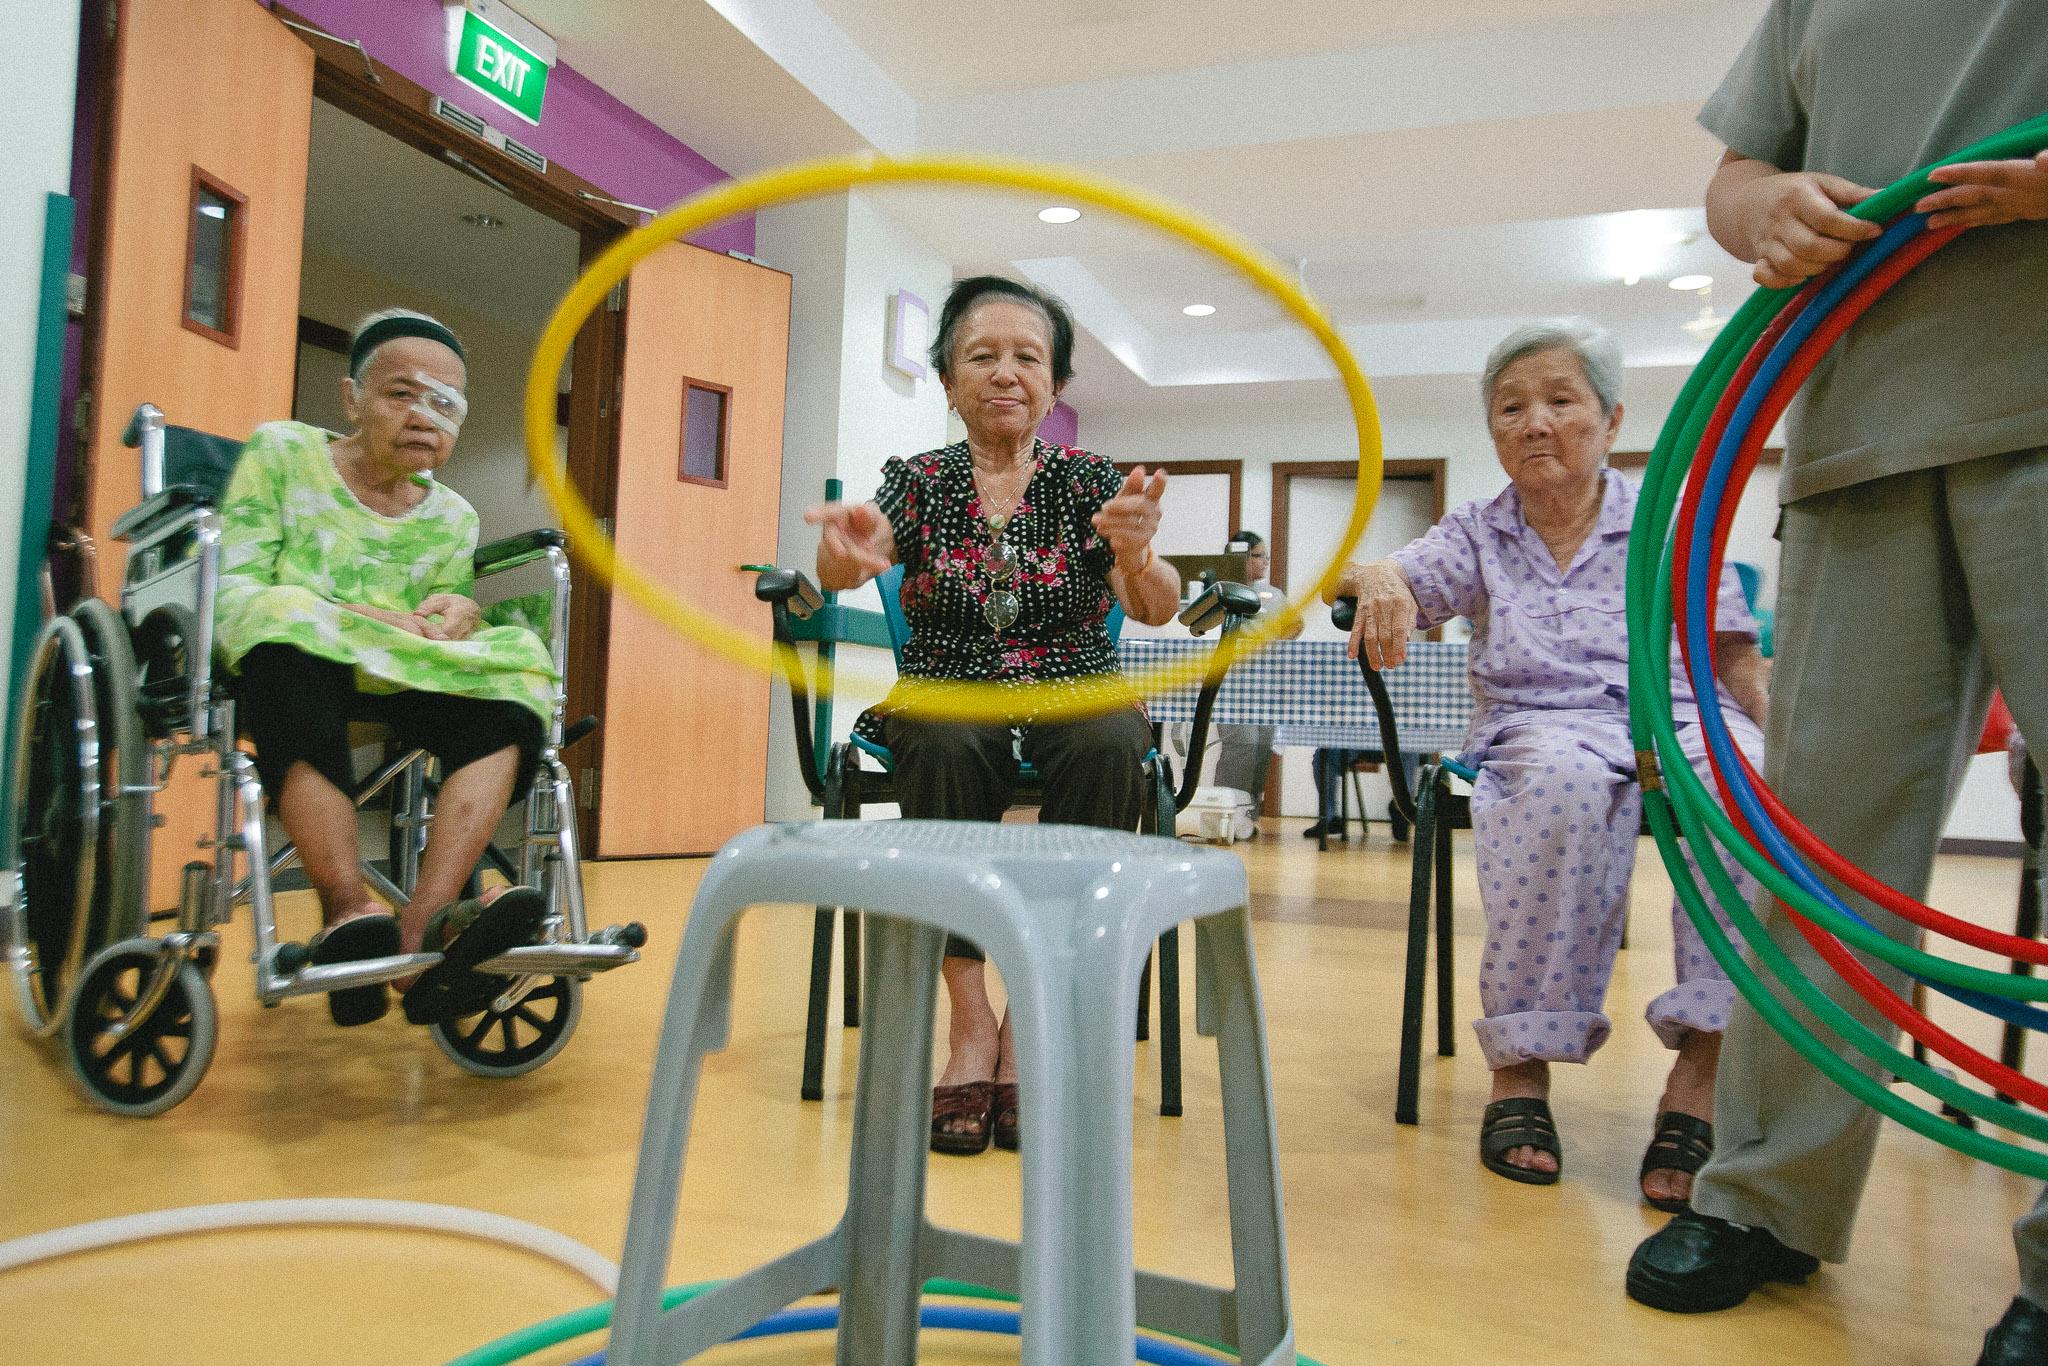 singapore-photographer-hospice-care-007.jpg